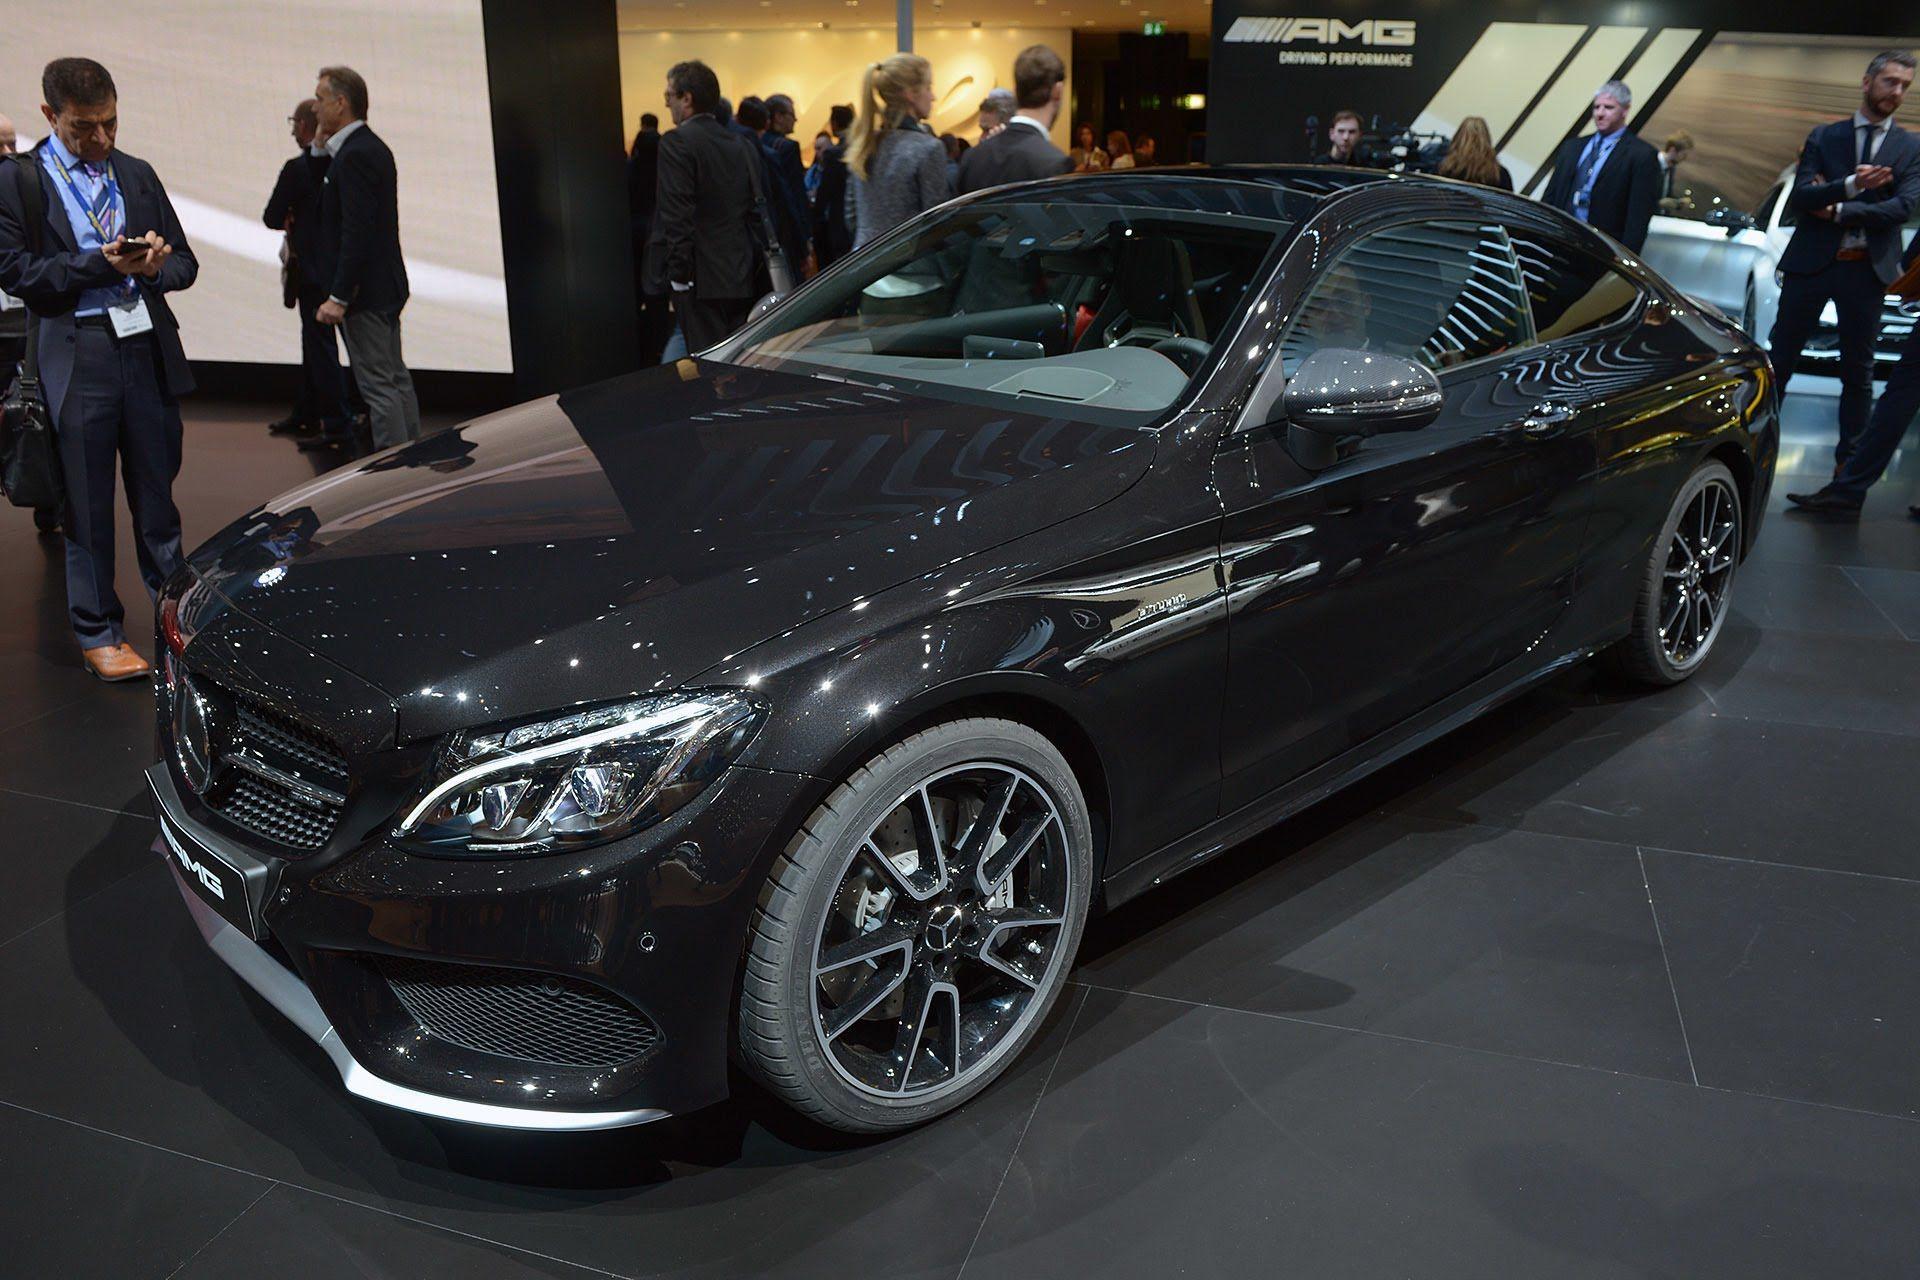 2017 mercedes amg c43 coupe 2016 geneva motor show mercedes benz pinterest mercedes car. Black Bedroom Furniture Sets. Home Design Ideas